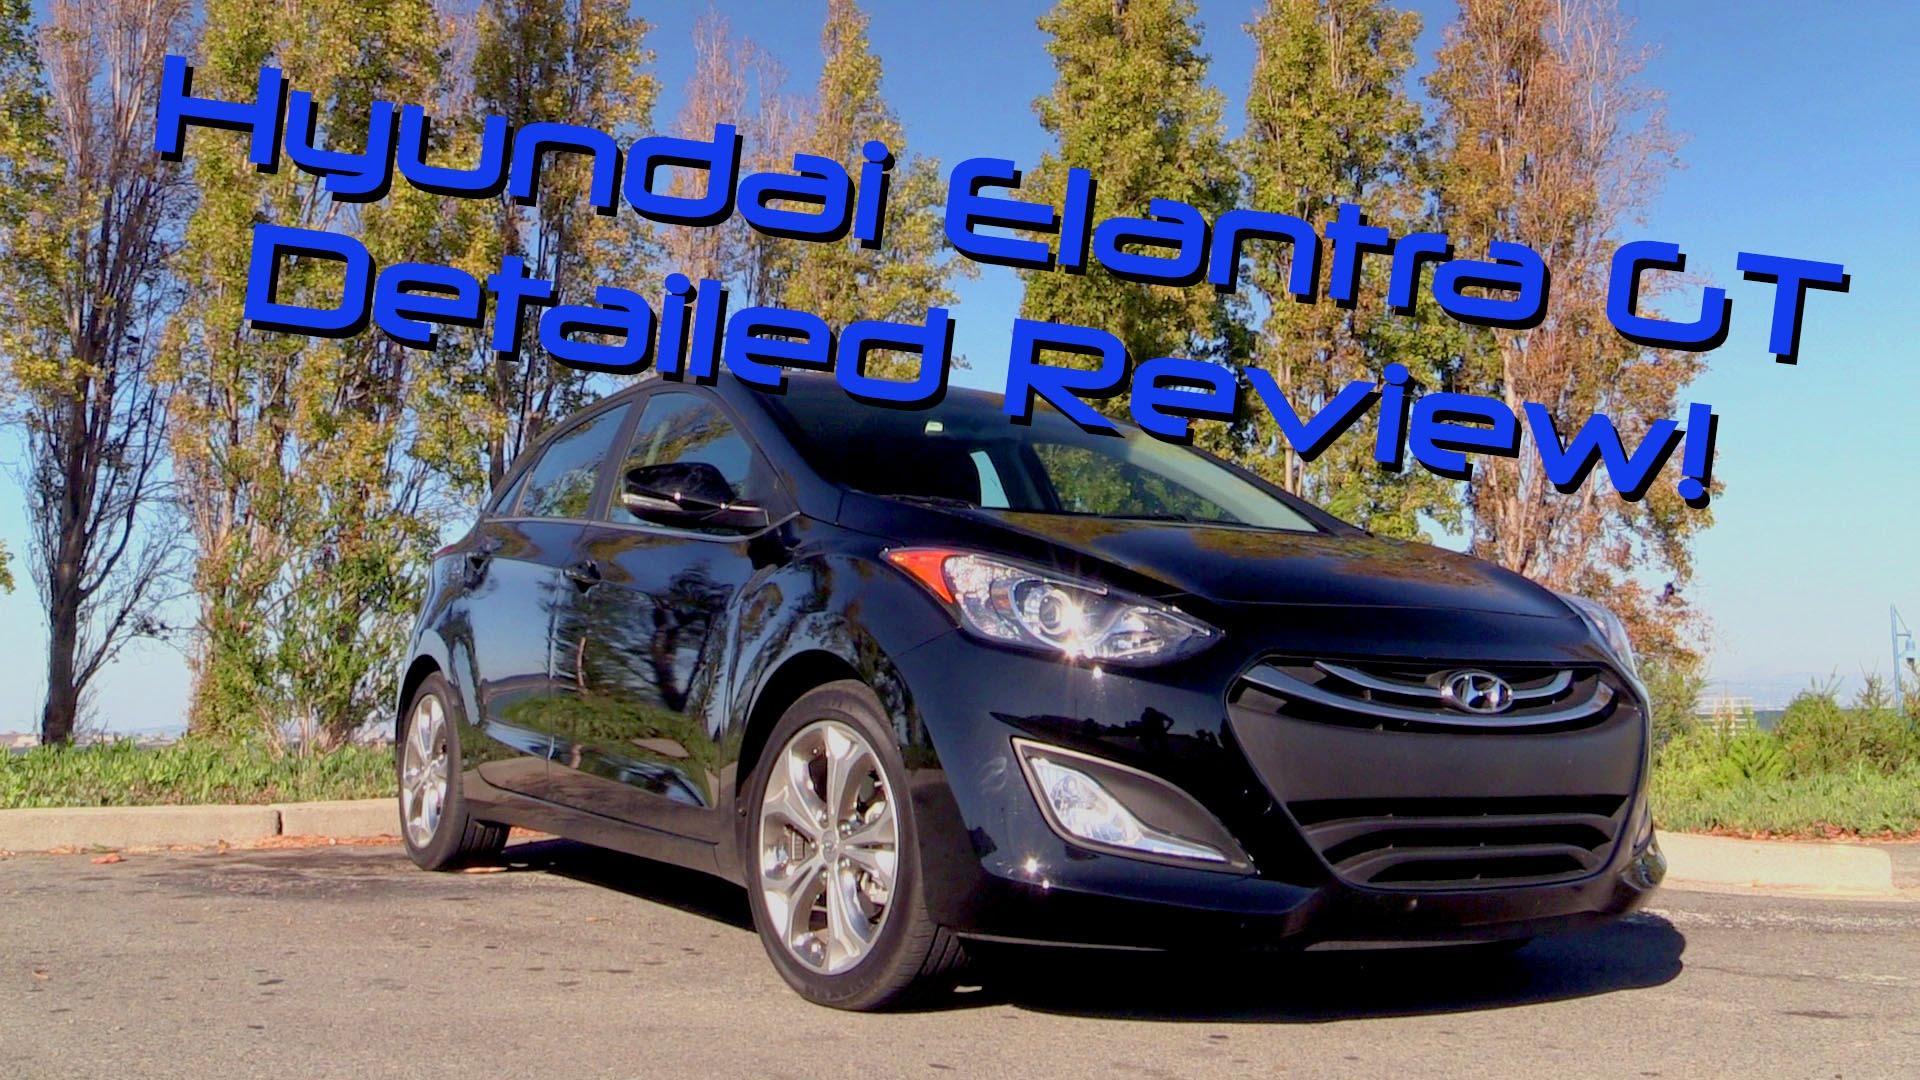 2016 Hyundai Elantra gt Car Review WalkThrough Video